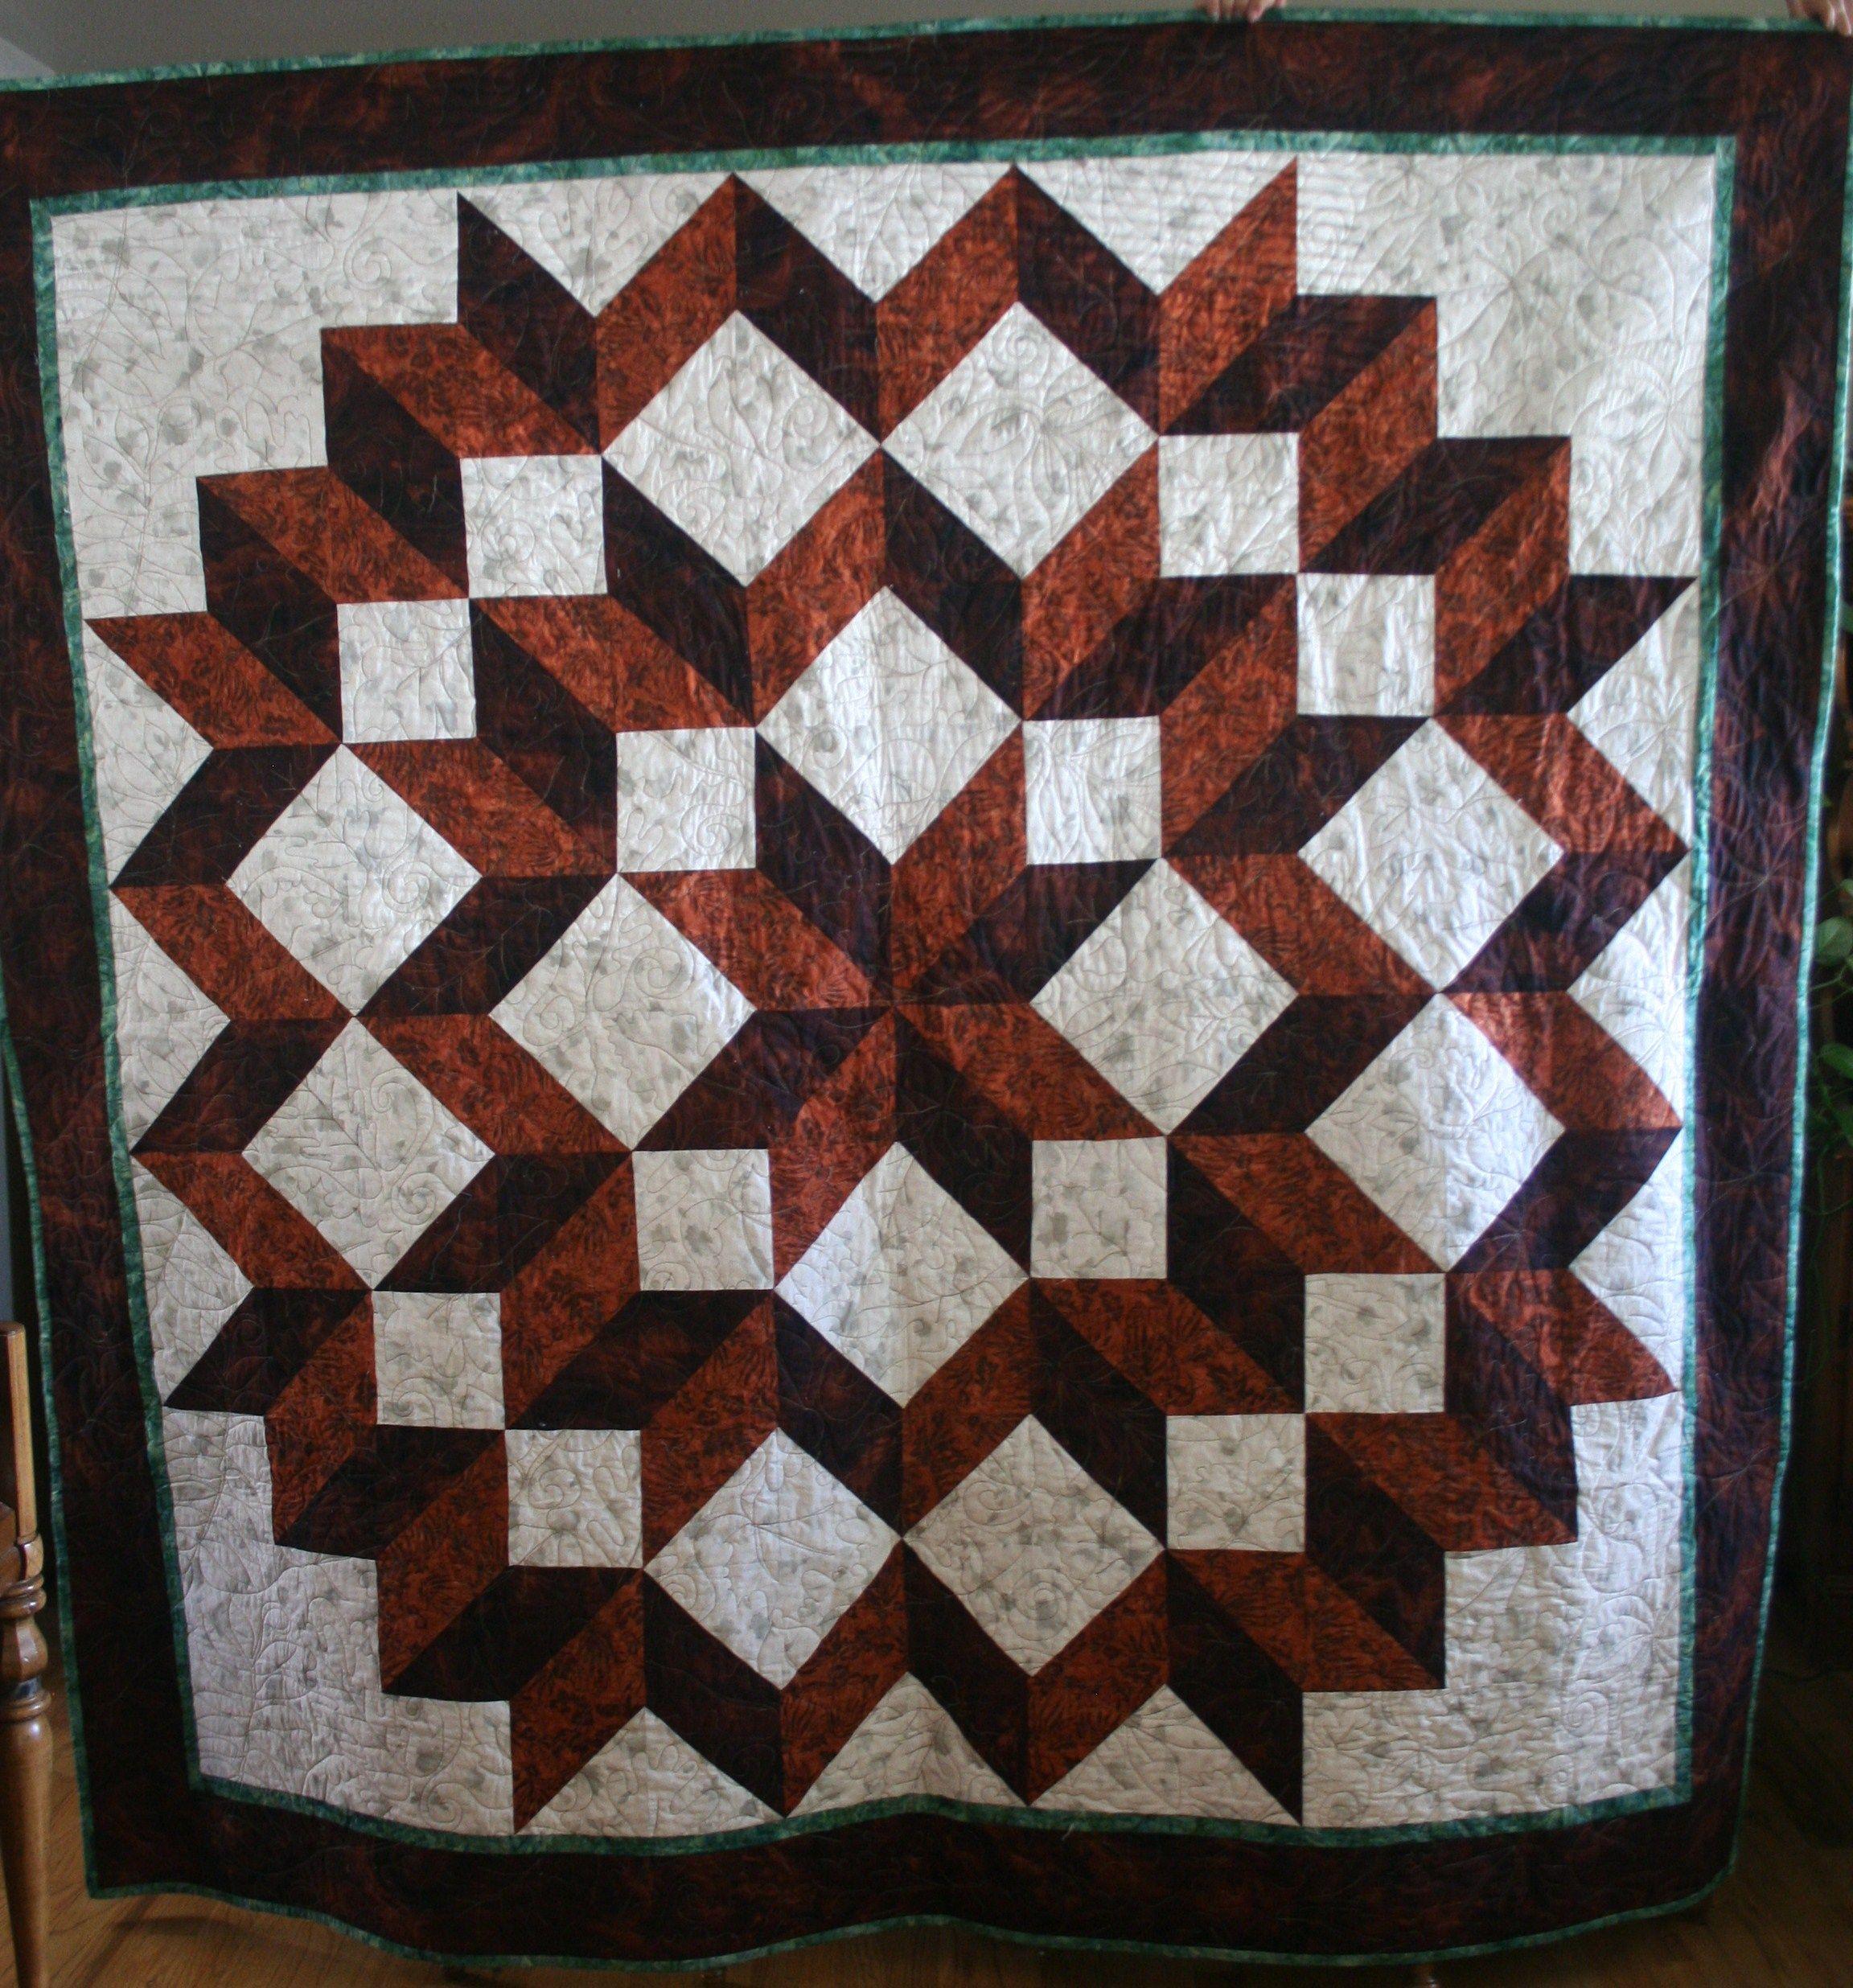 Carpenter's Star | Quilt patterns free, Star quilt patterns and ... : free star quilt patterns - Adamdwight.com